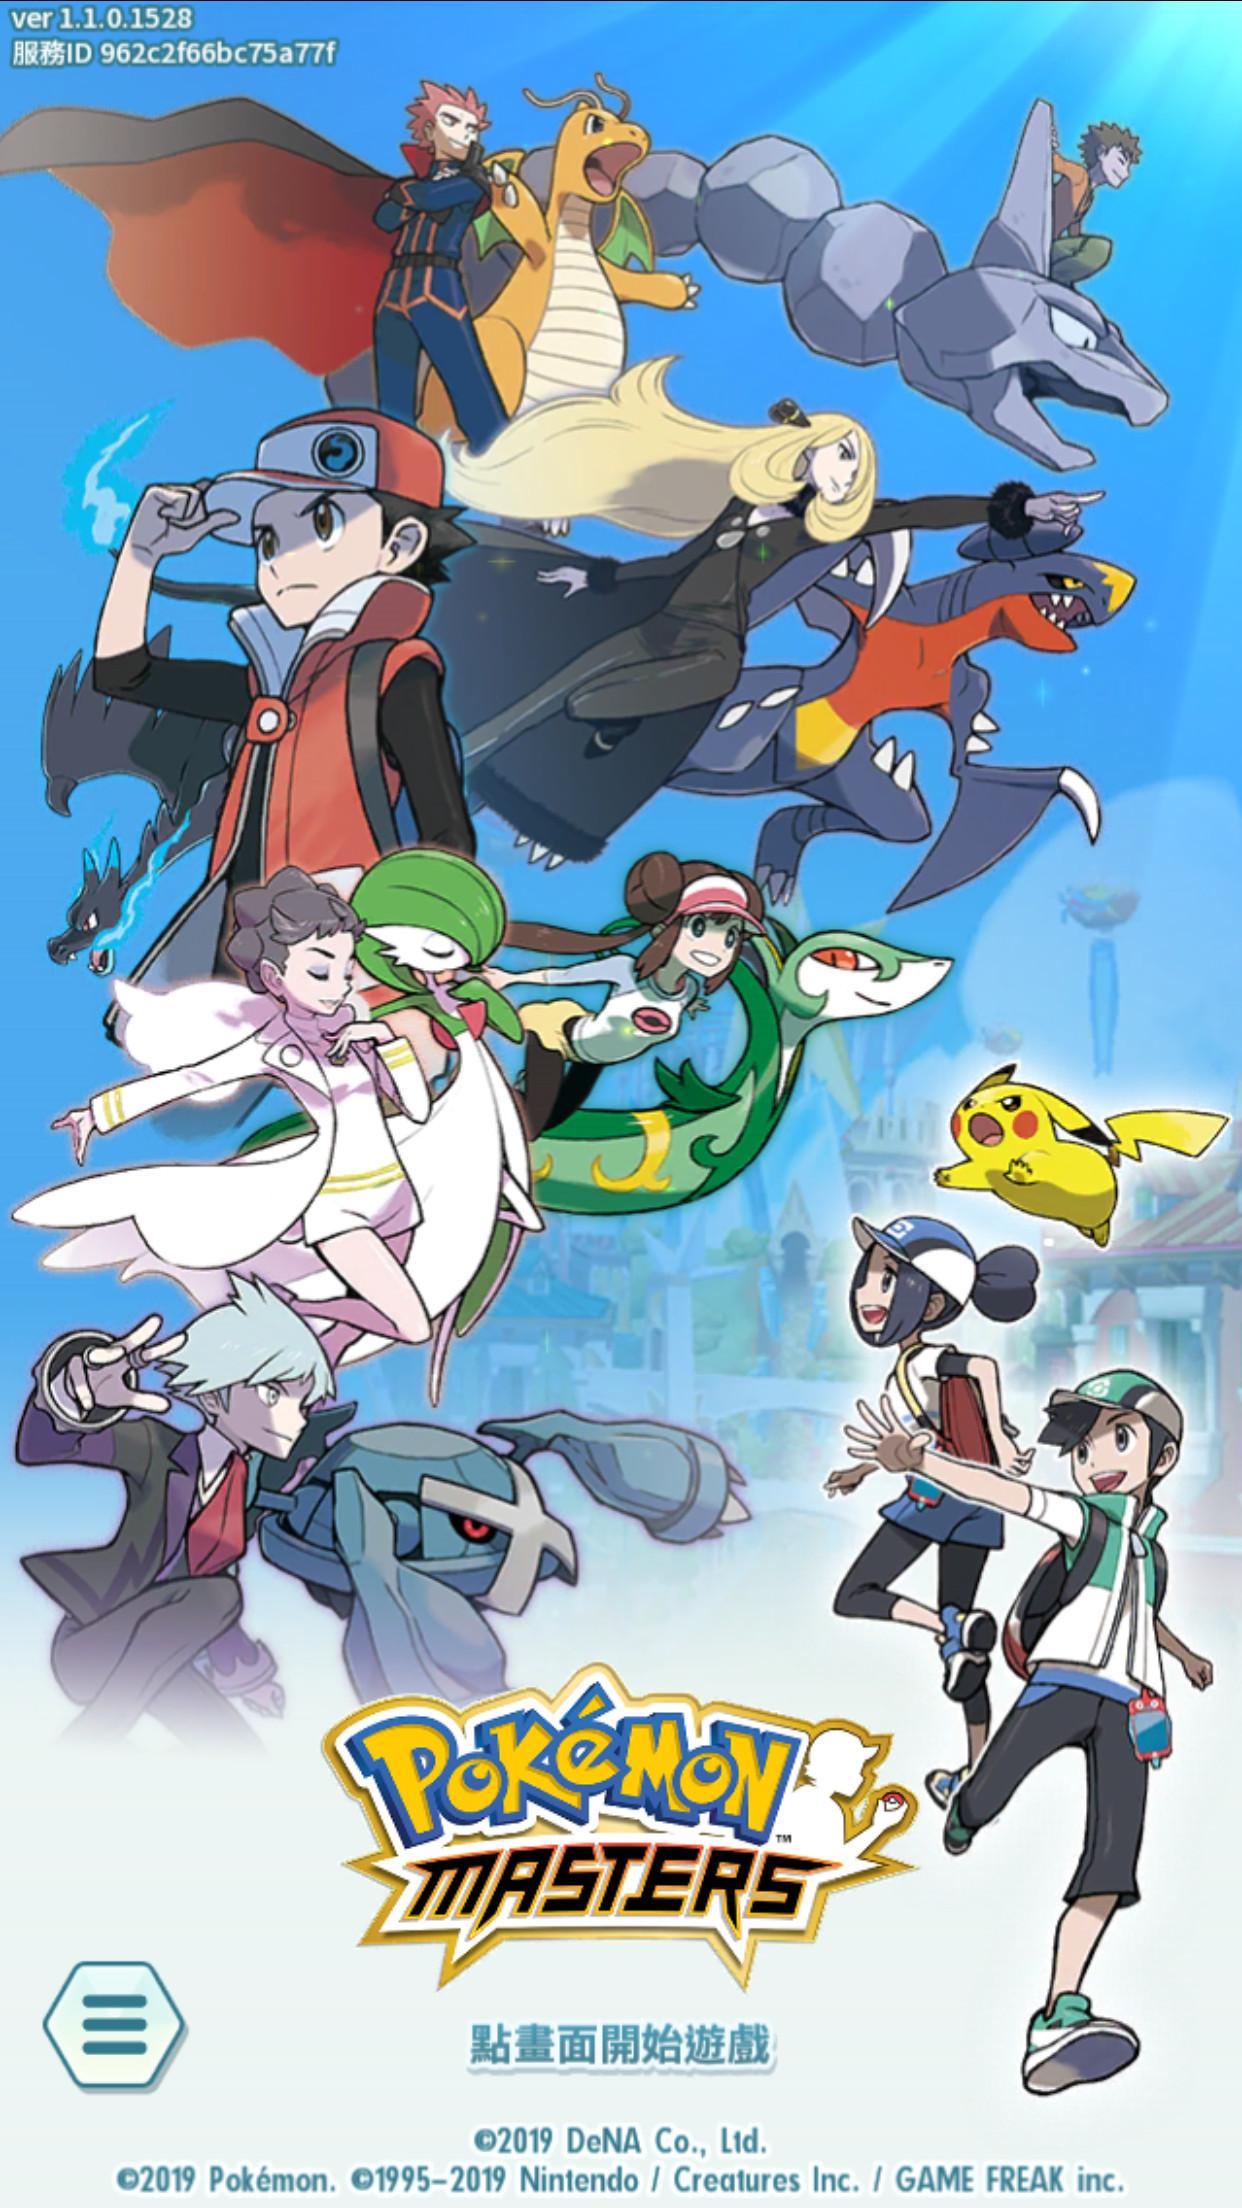 ▲▼《Pokémon Masters》。(圖/Kiki提供,請勿隨意翻拍,以免侵權。)